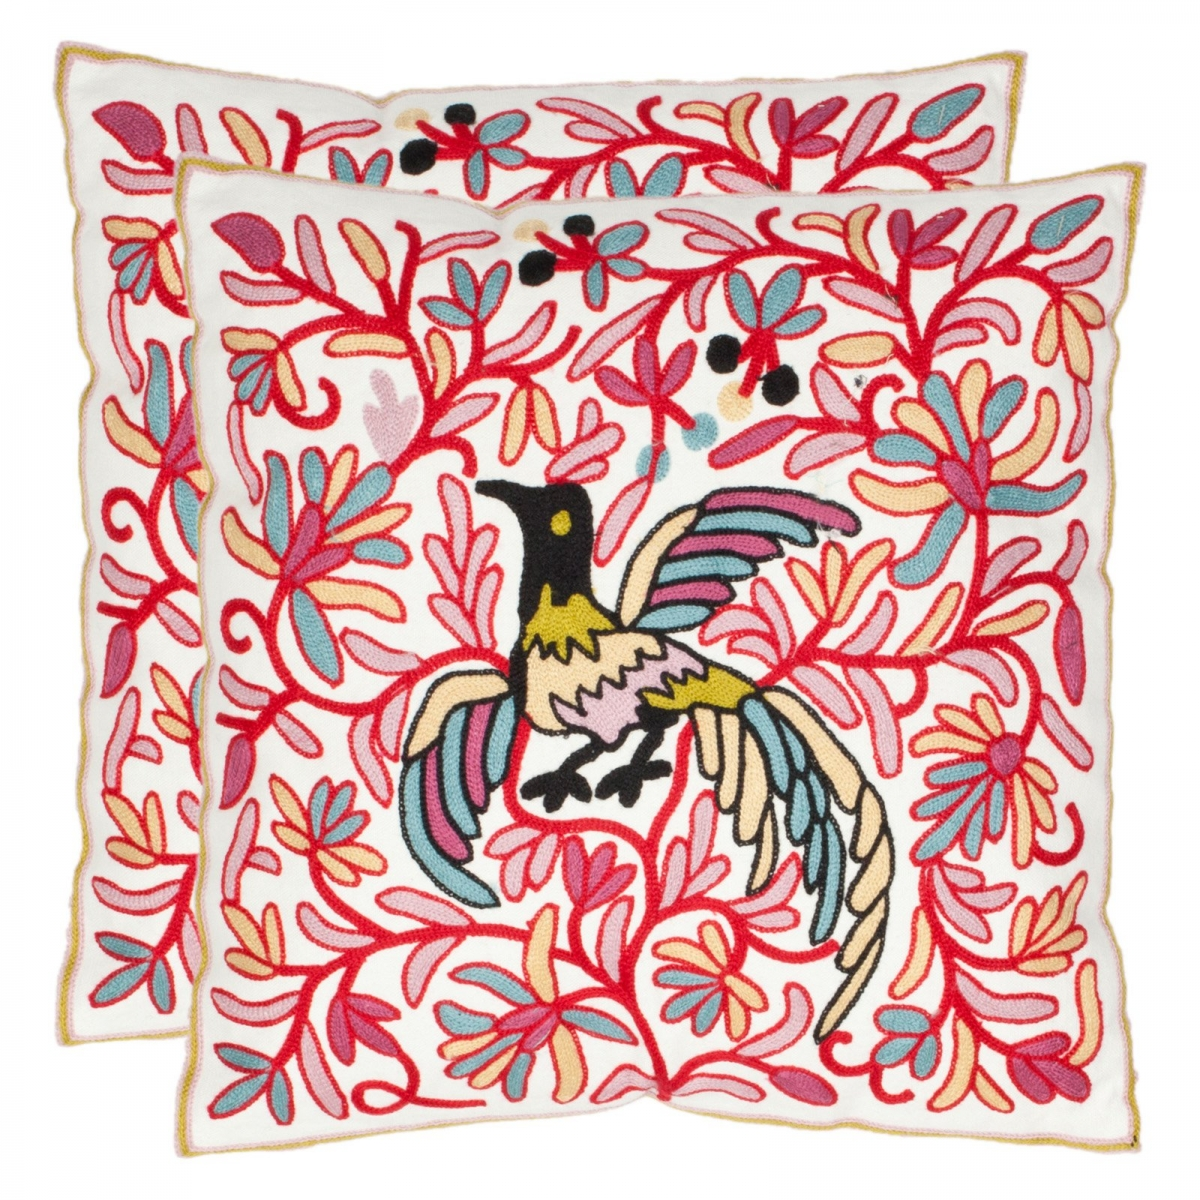 Safavieh-Matlock-18-in.-Cream-&-Red-Decorative-Pillows-Set-of-2